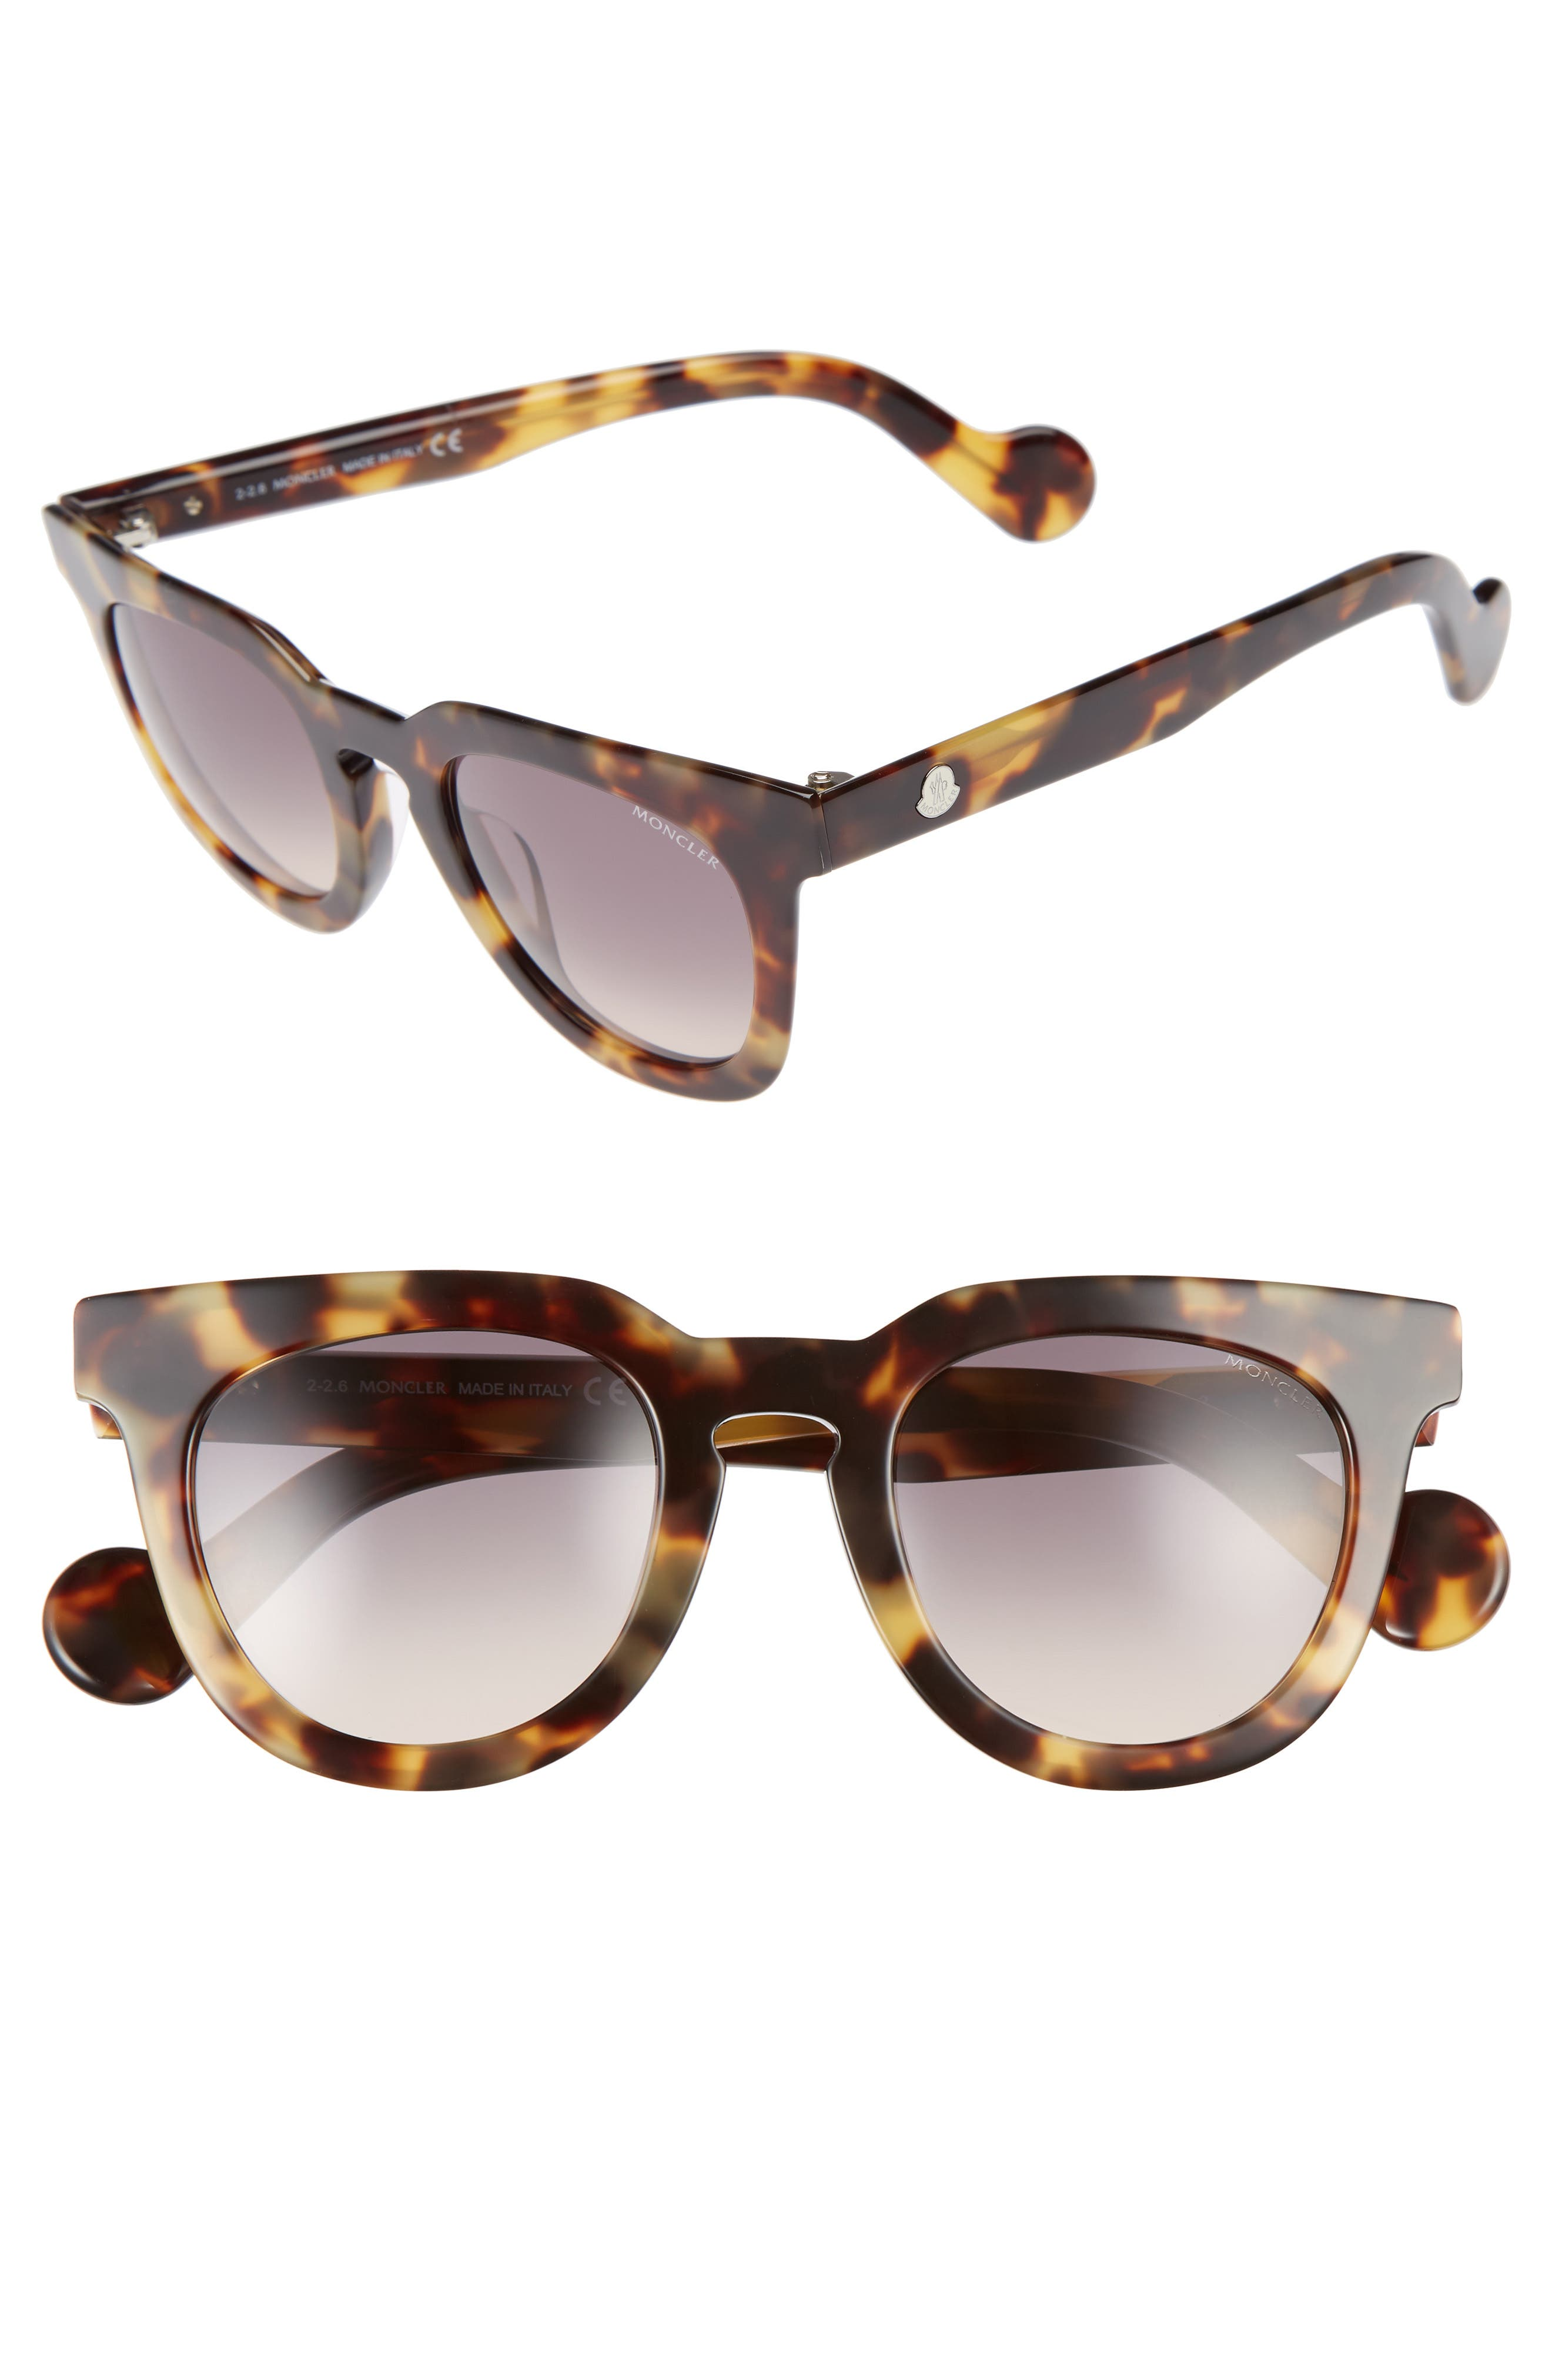 48mm Retro Sunglasses,                         Main,                         color, Blonde Havana / Gradient Smoke